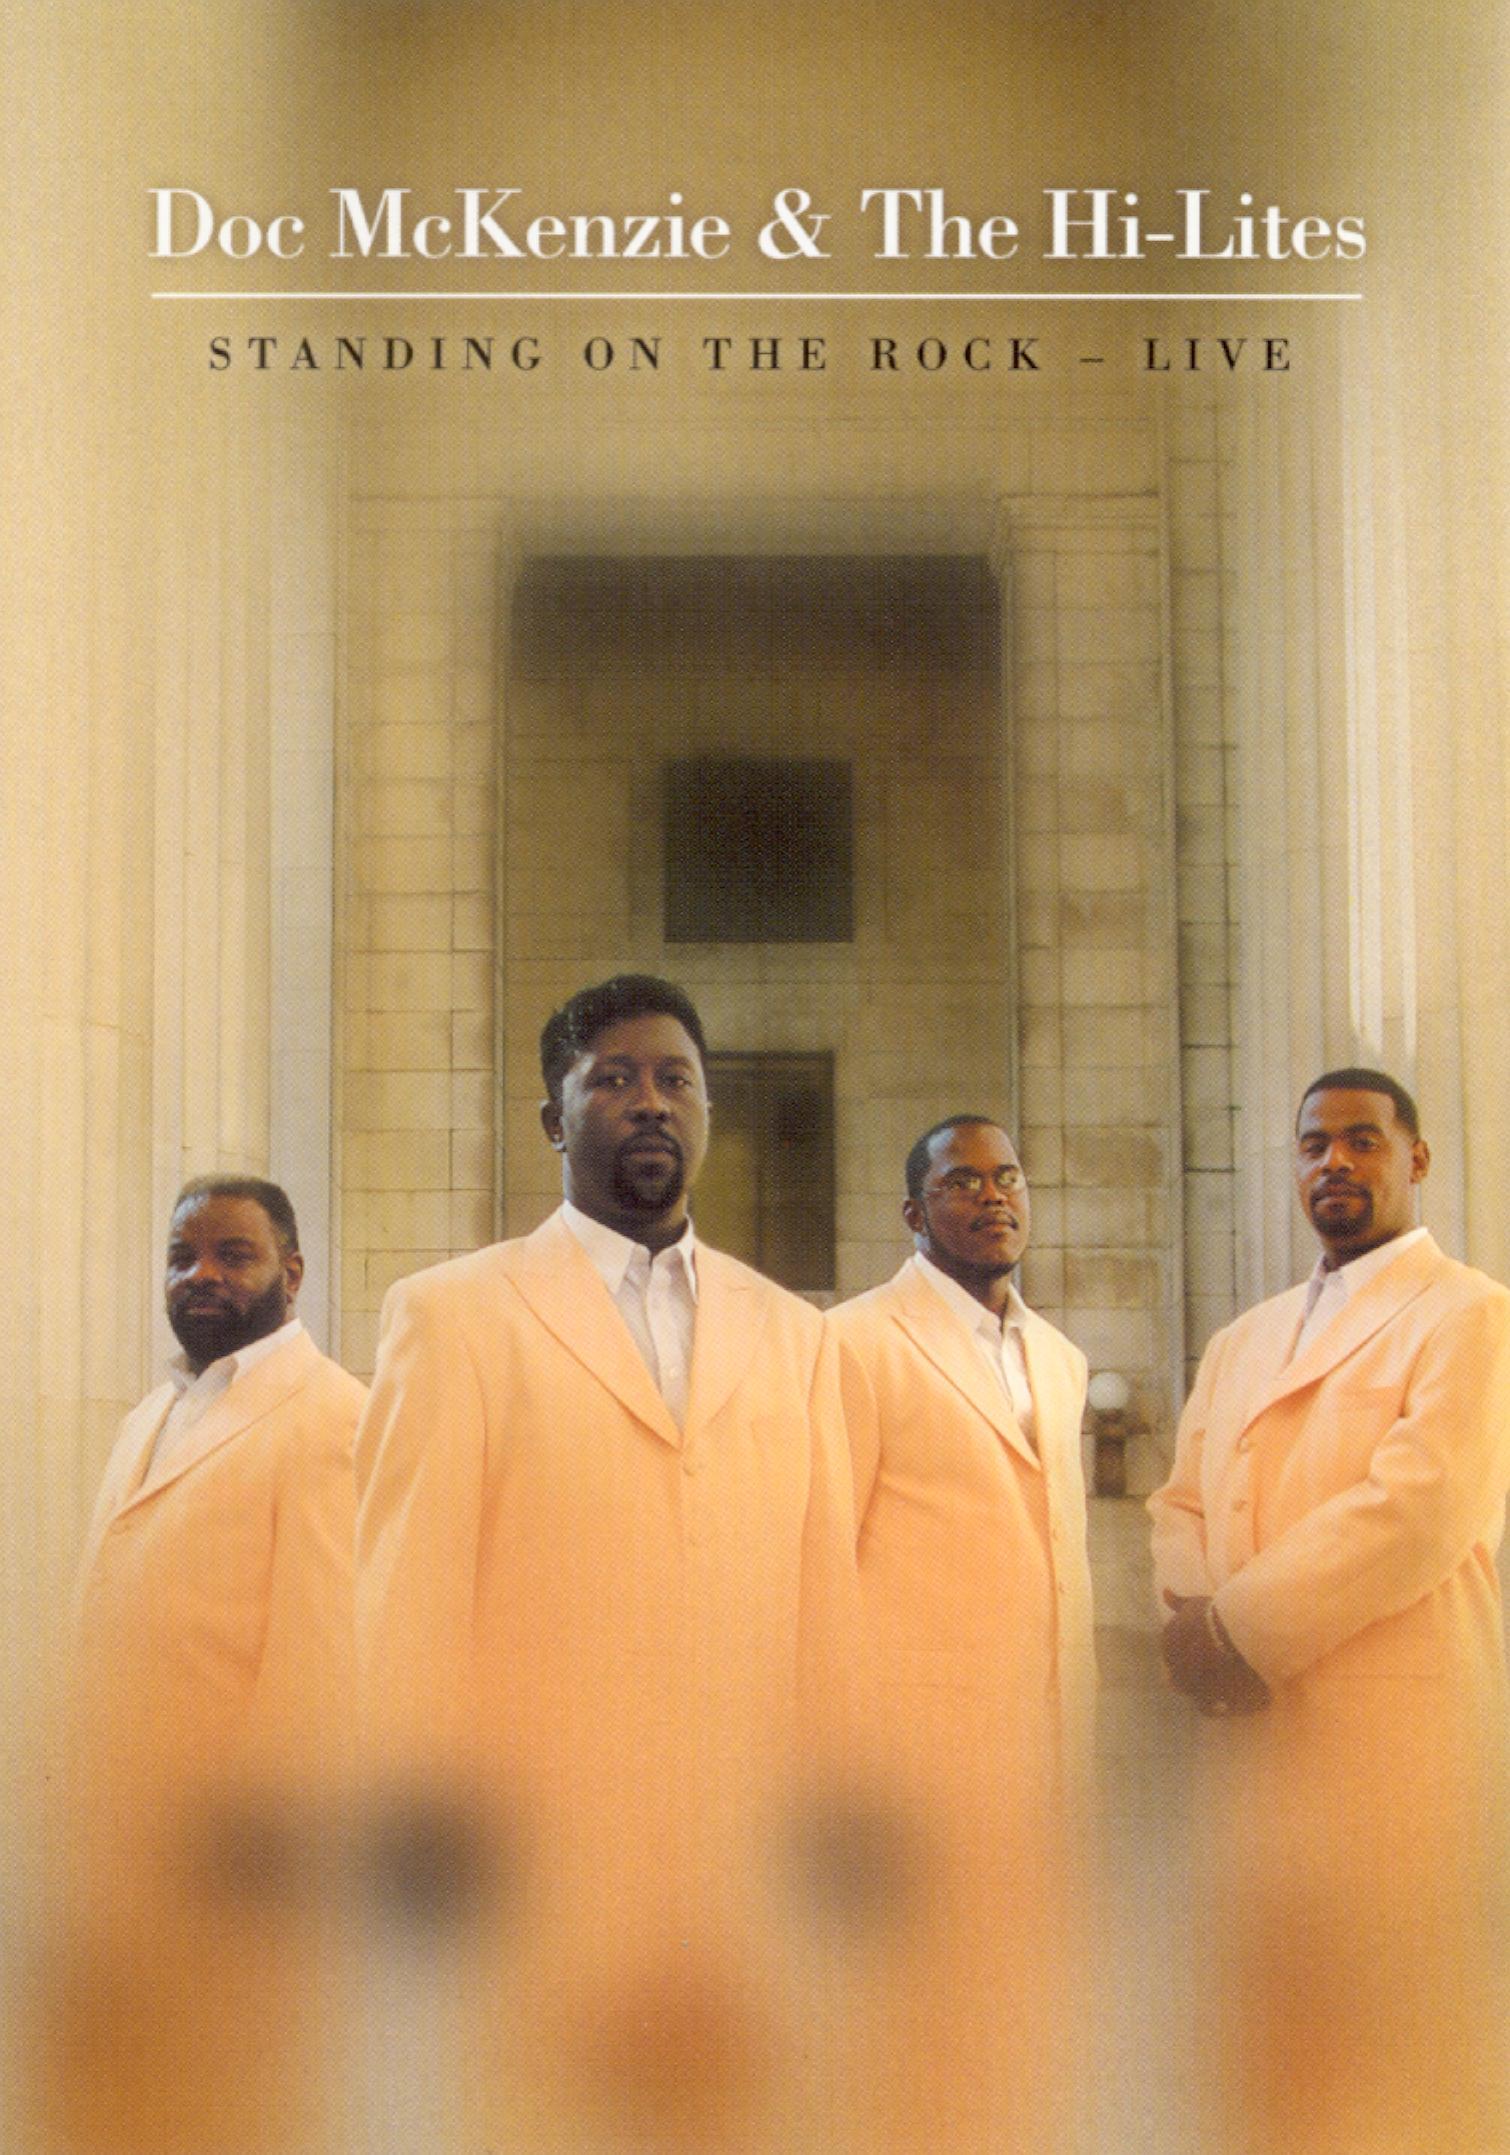 Doc McKenzie & the Hi-Lites: Standing On the Rock Live